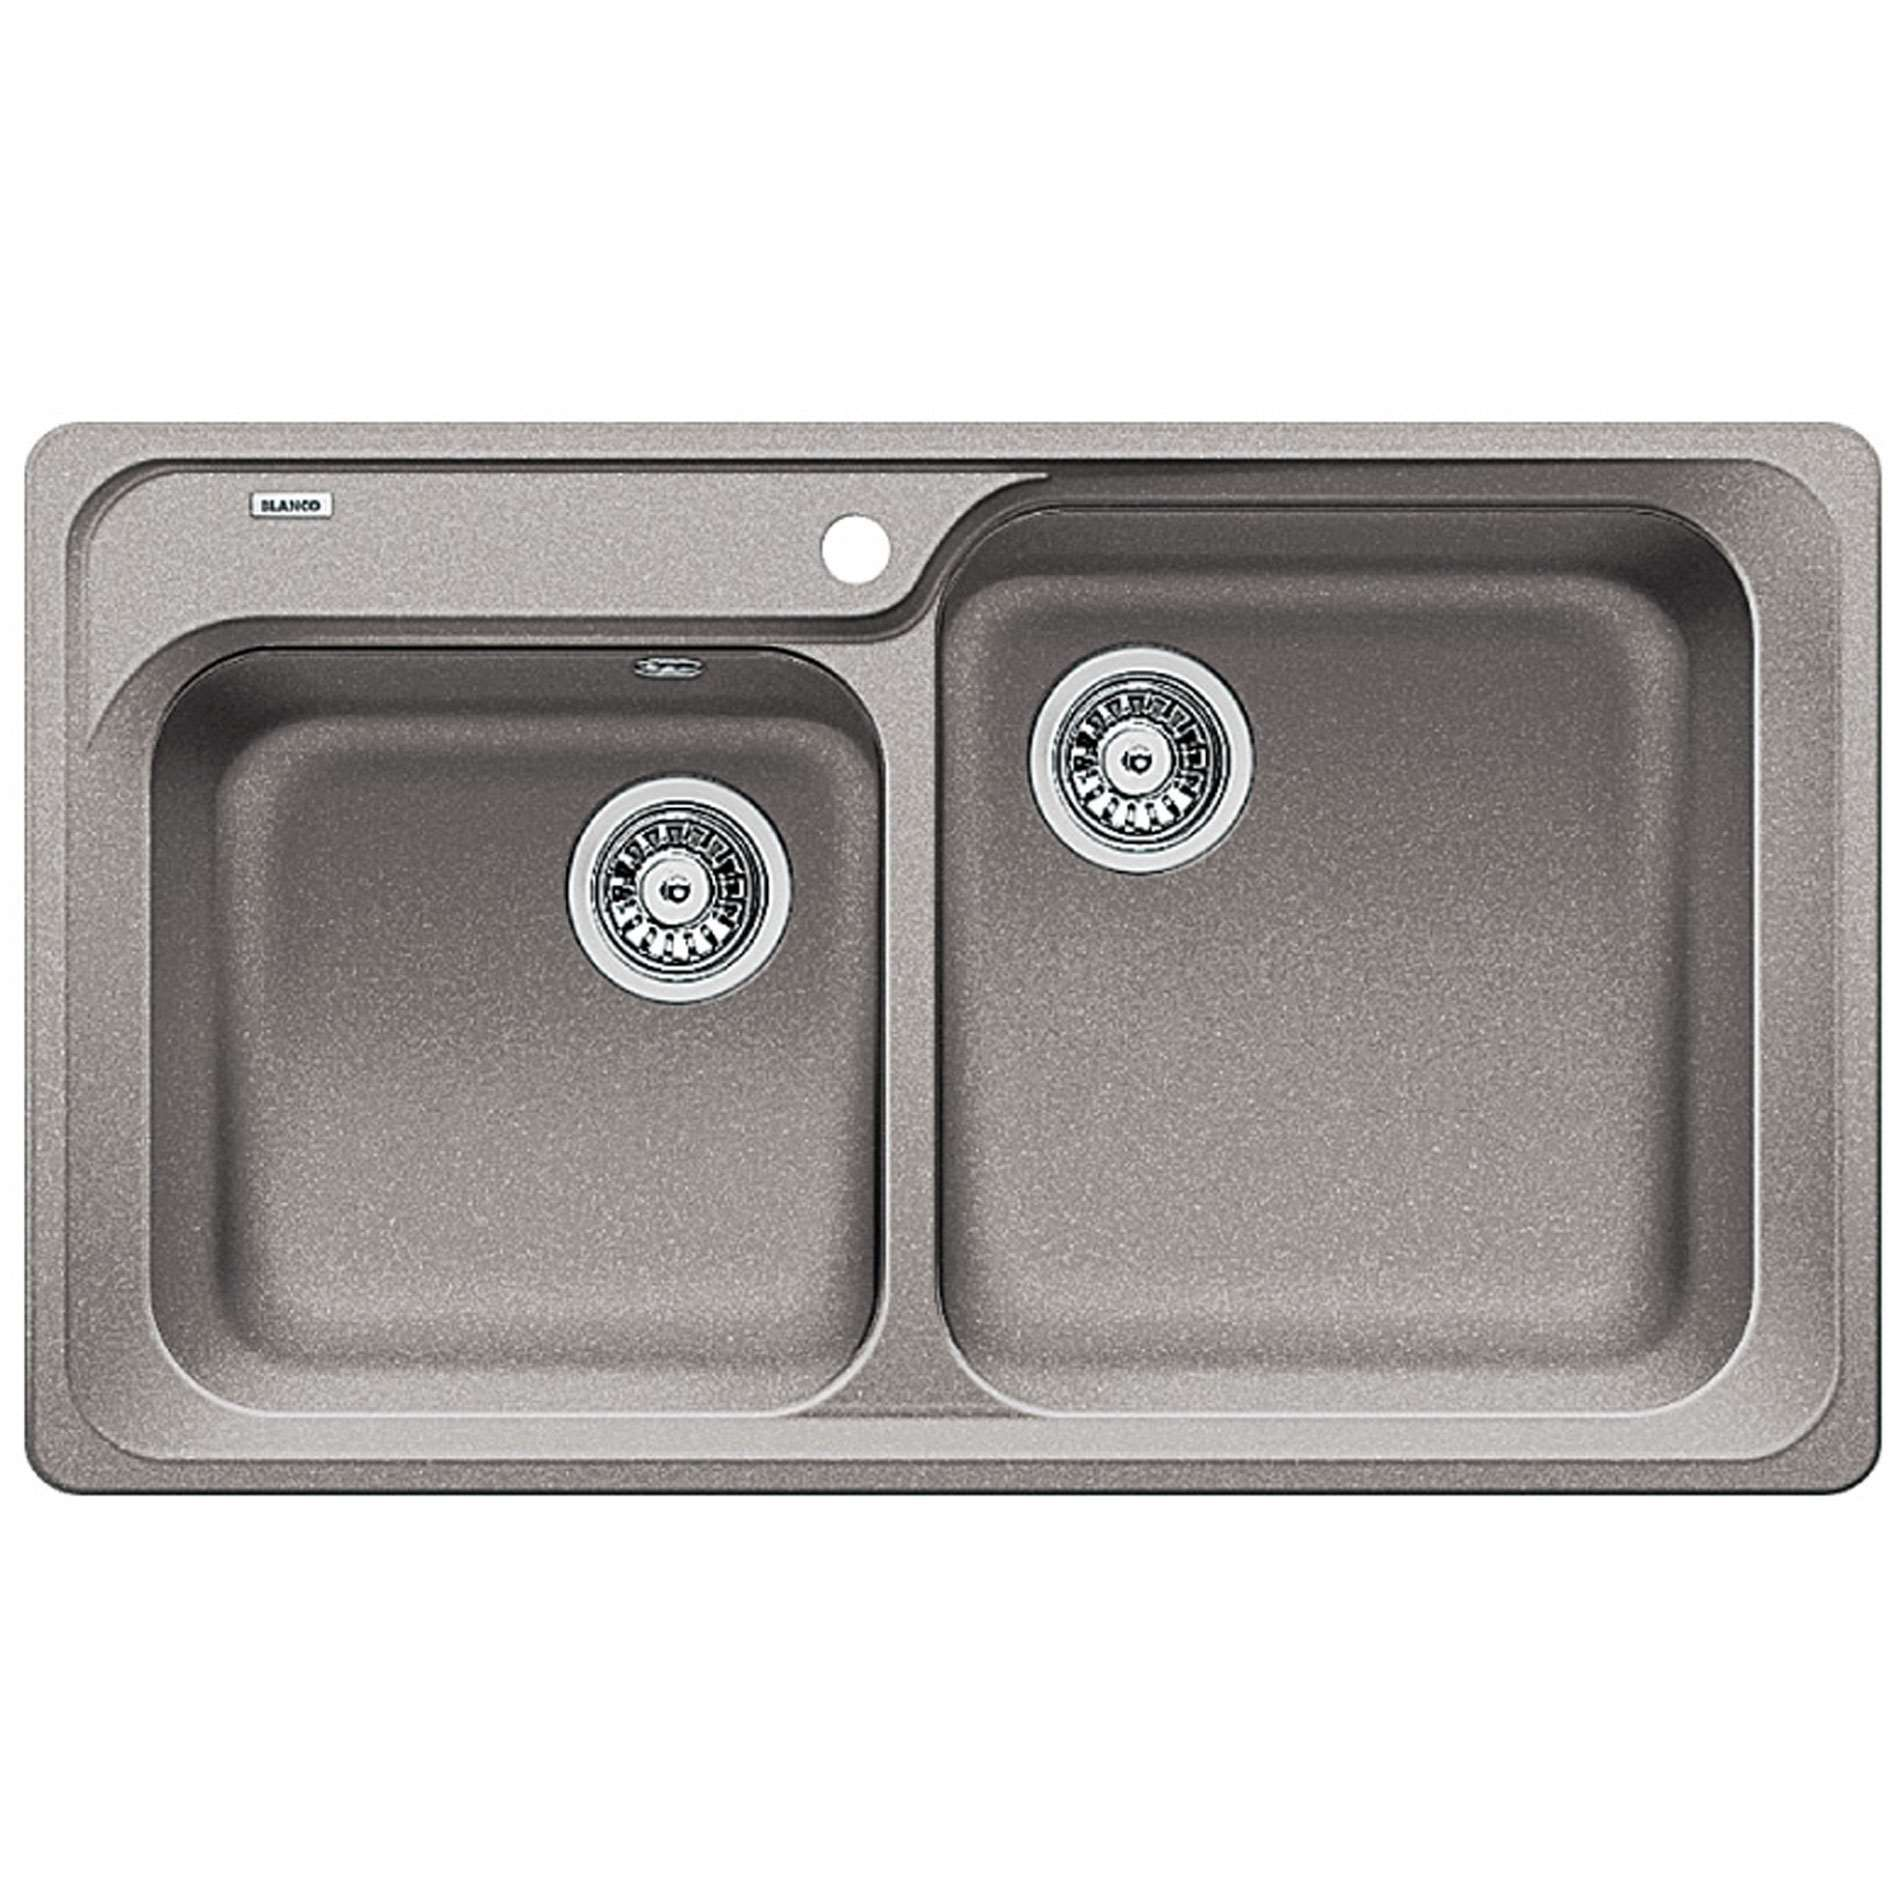 Blanco Classic : Blanco: Classic 8 Alumetallic Silgranit Sink - Kitchen Sinks & Taps